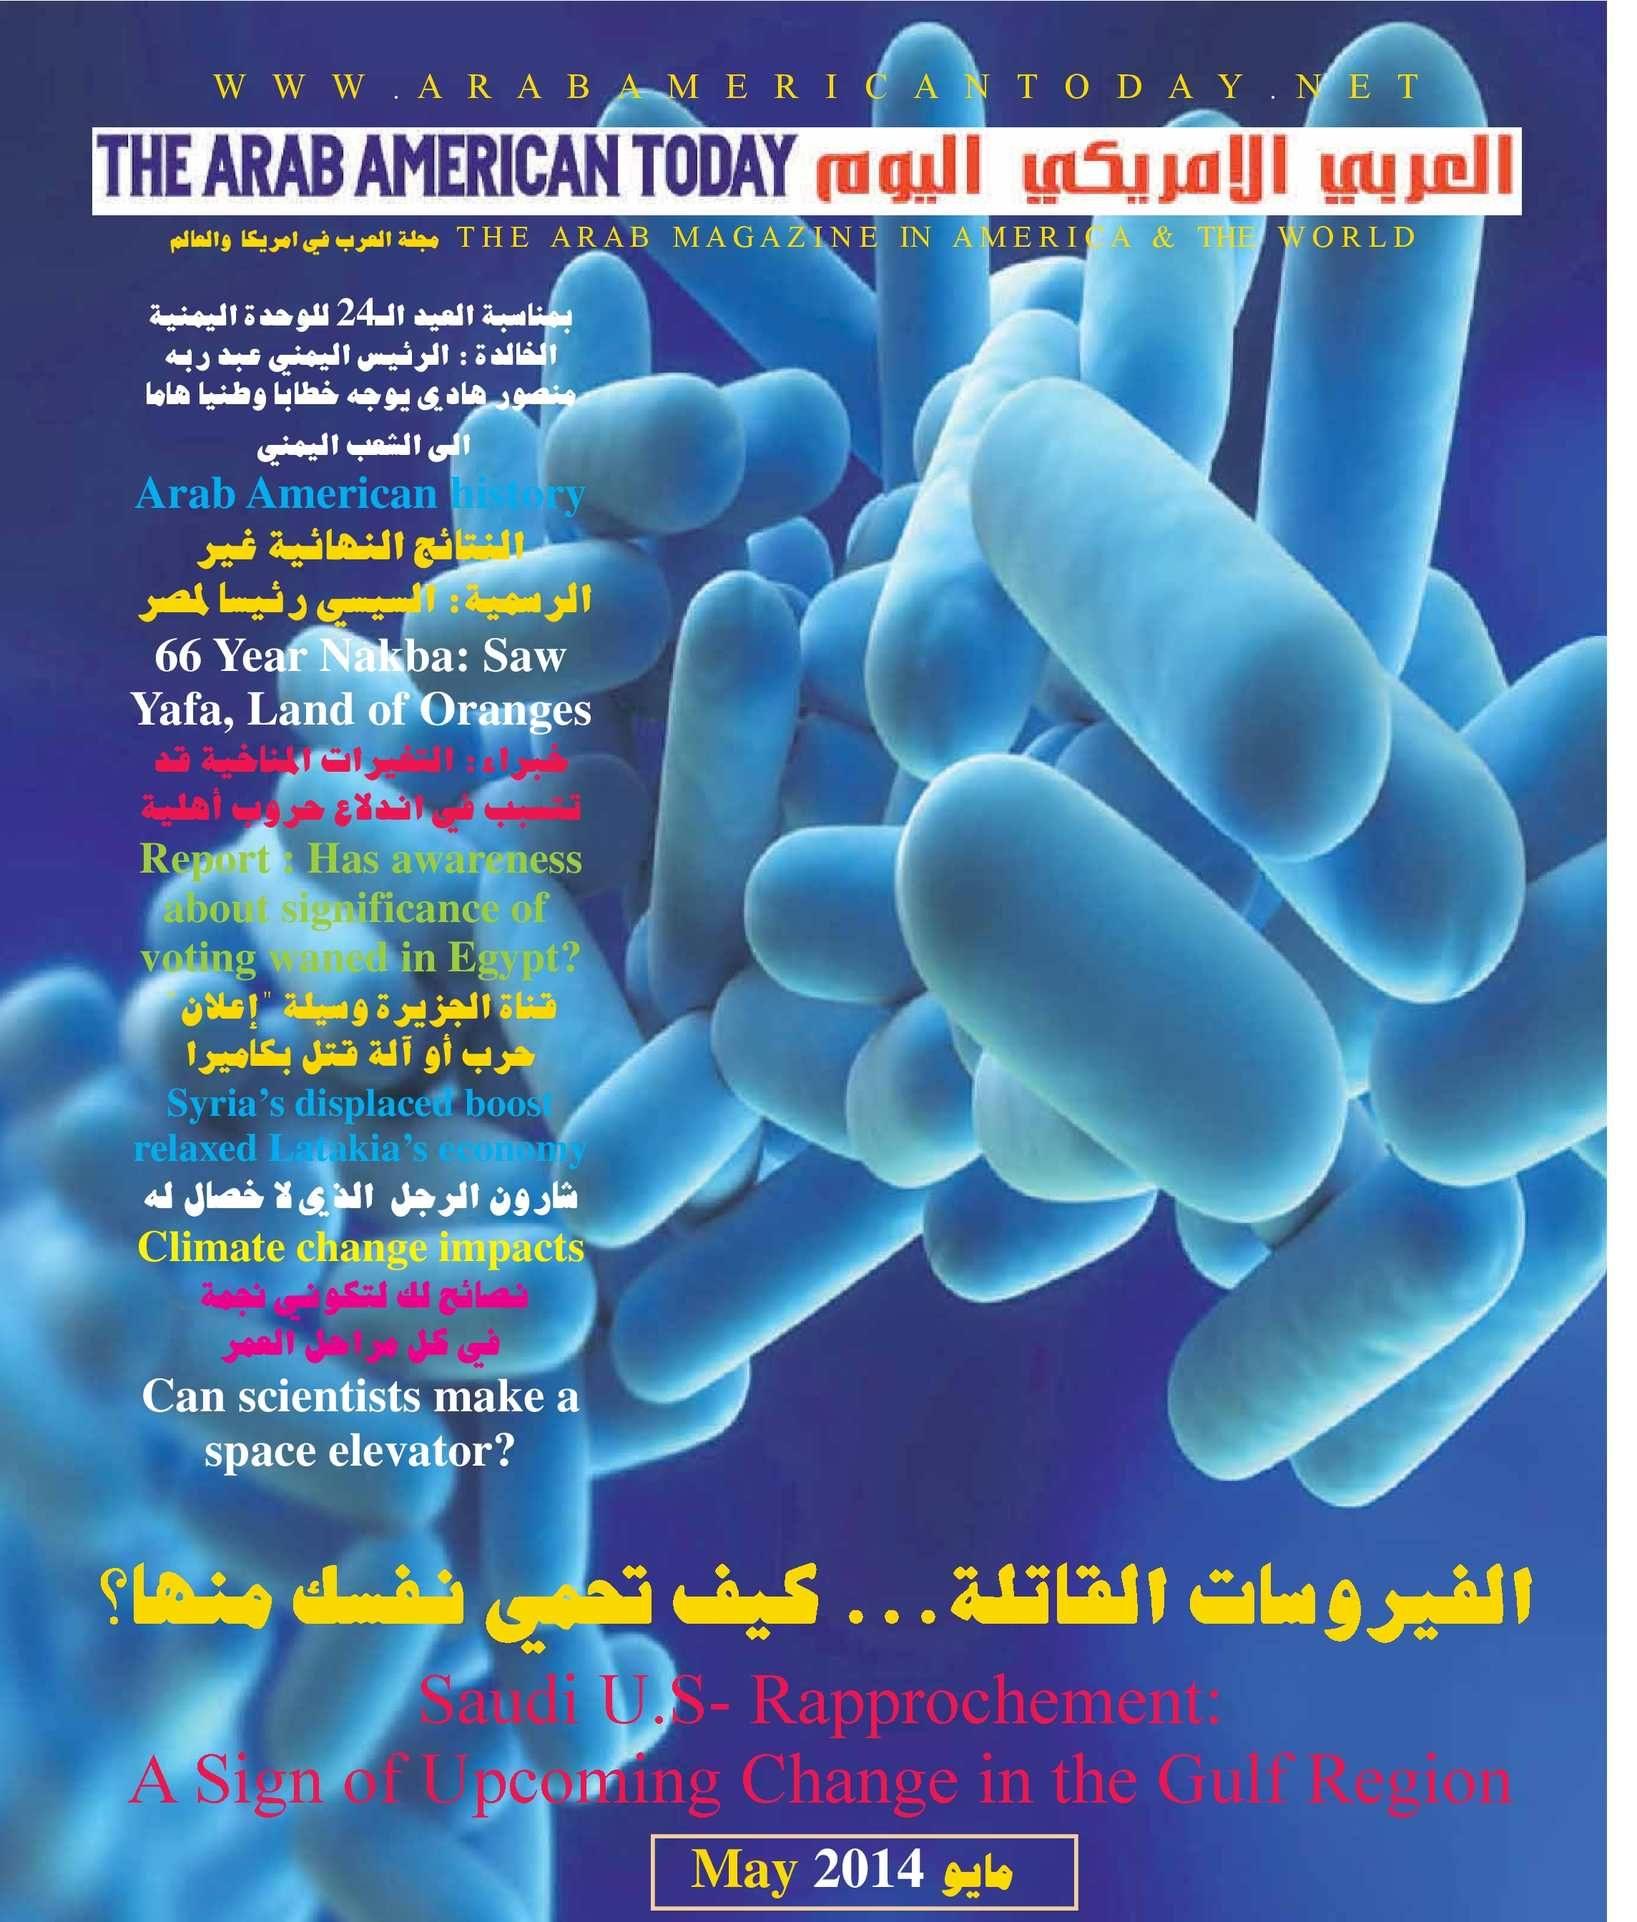 Lit Bébé D Appoint Inspirant Calaméo Arab American News issue No 17